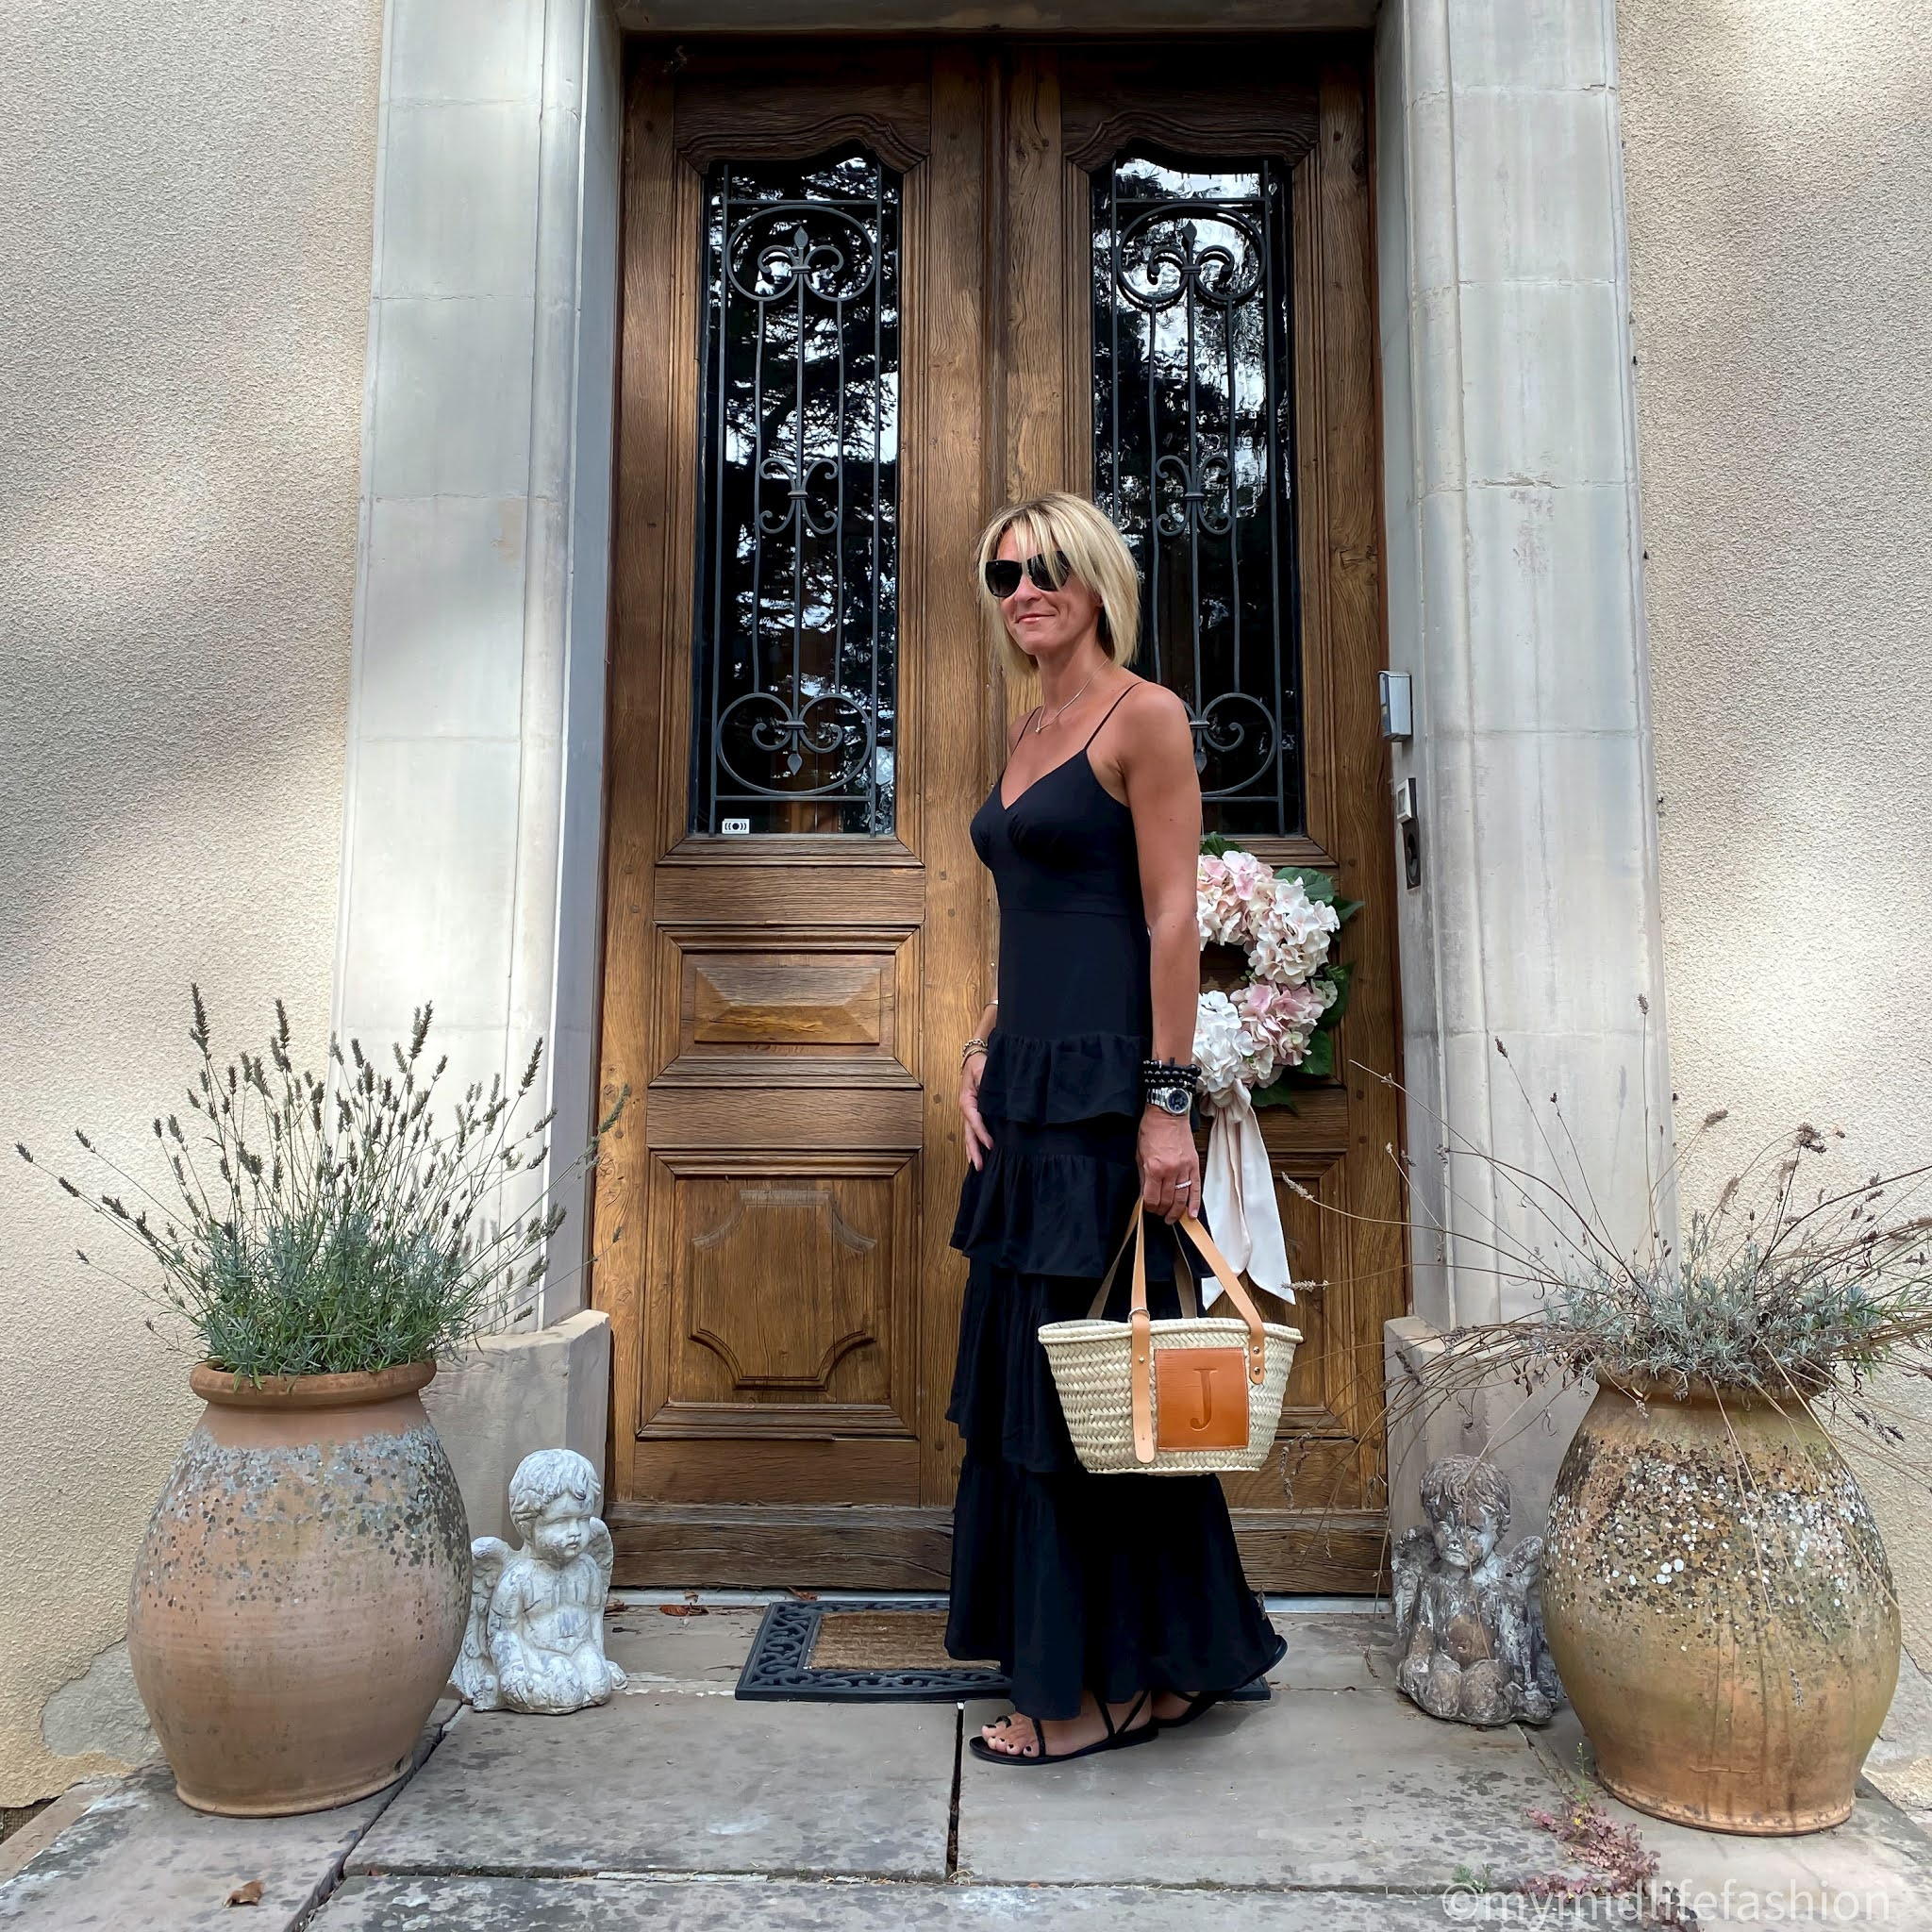 my midlife fashion, j crew ruffle tiered maxi dress, Ancient Greek plaited flat sandals, lada jewelry monogrammed basket